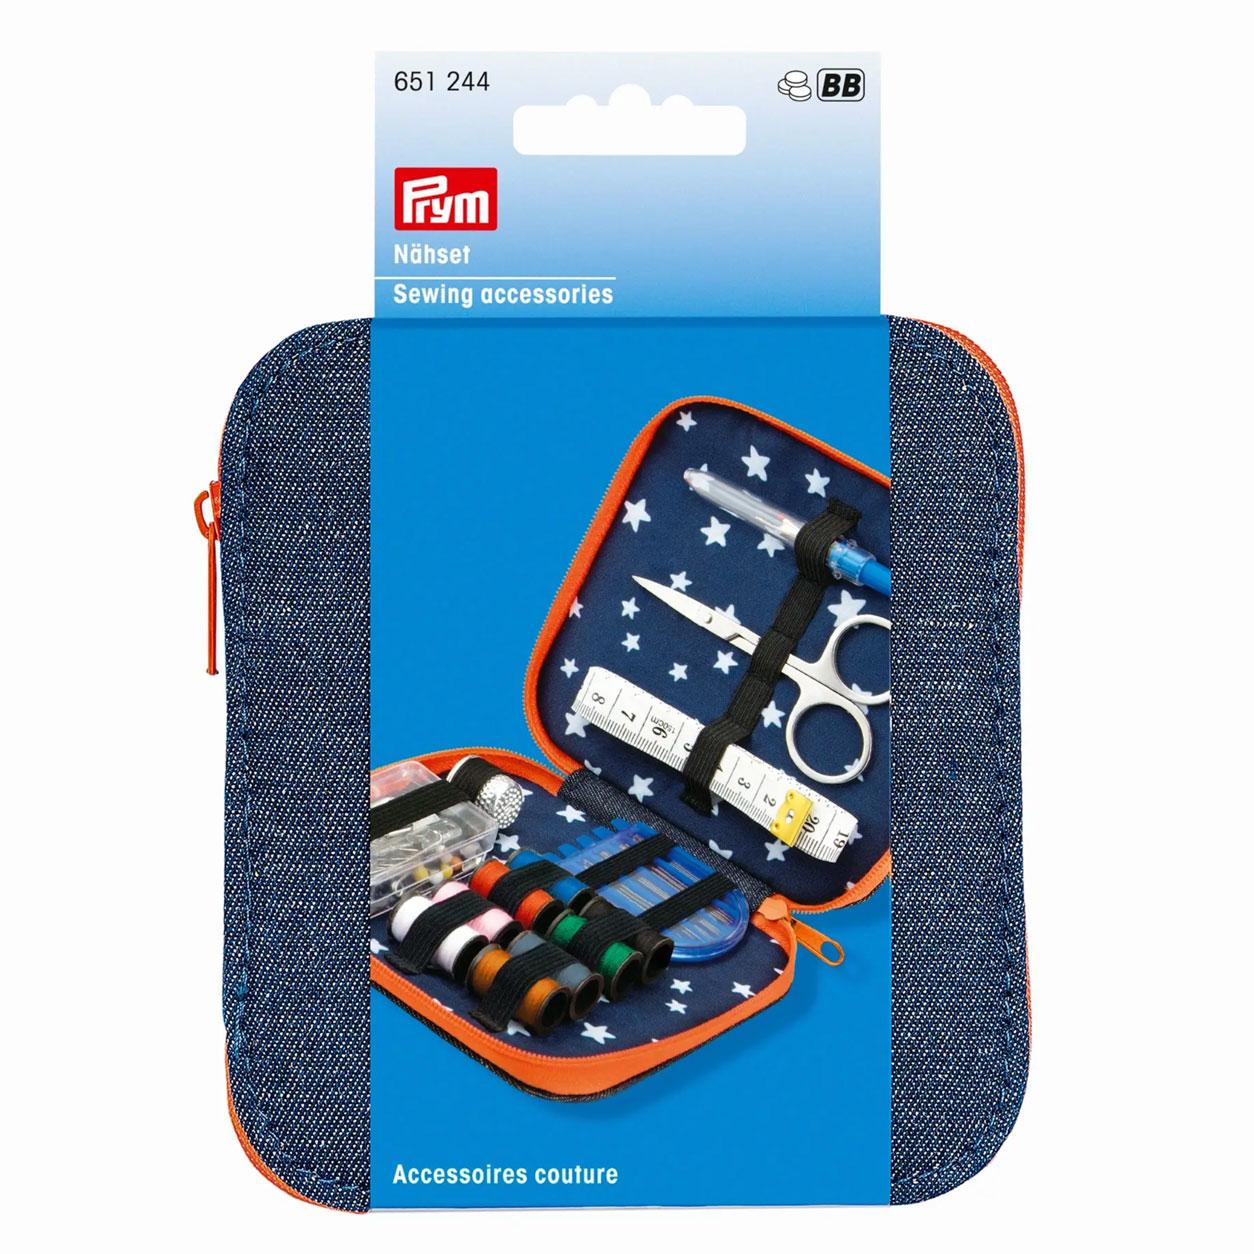 Kit Accessori per Cucito Prym